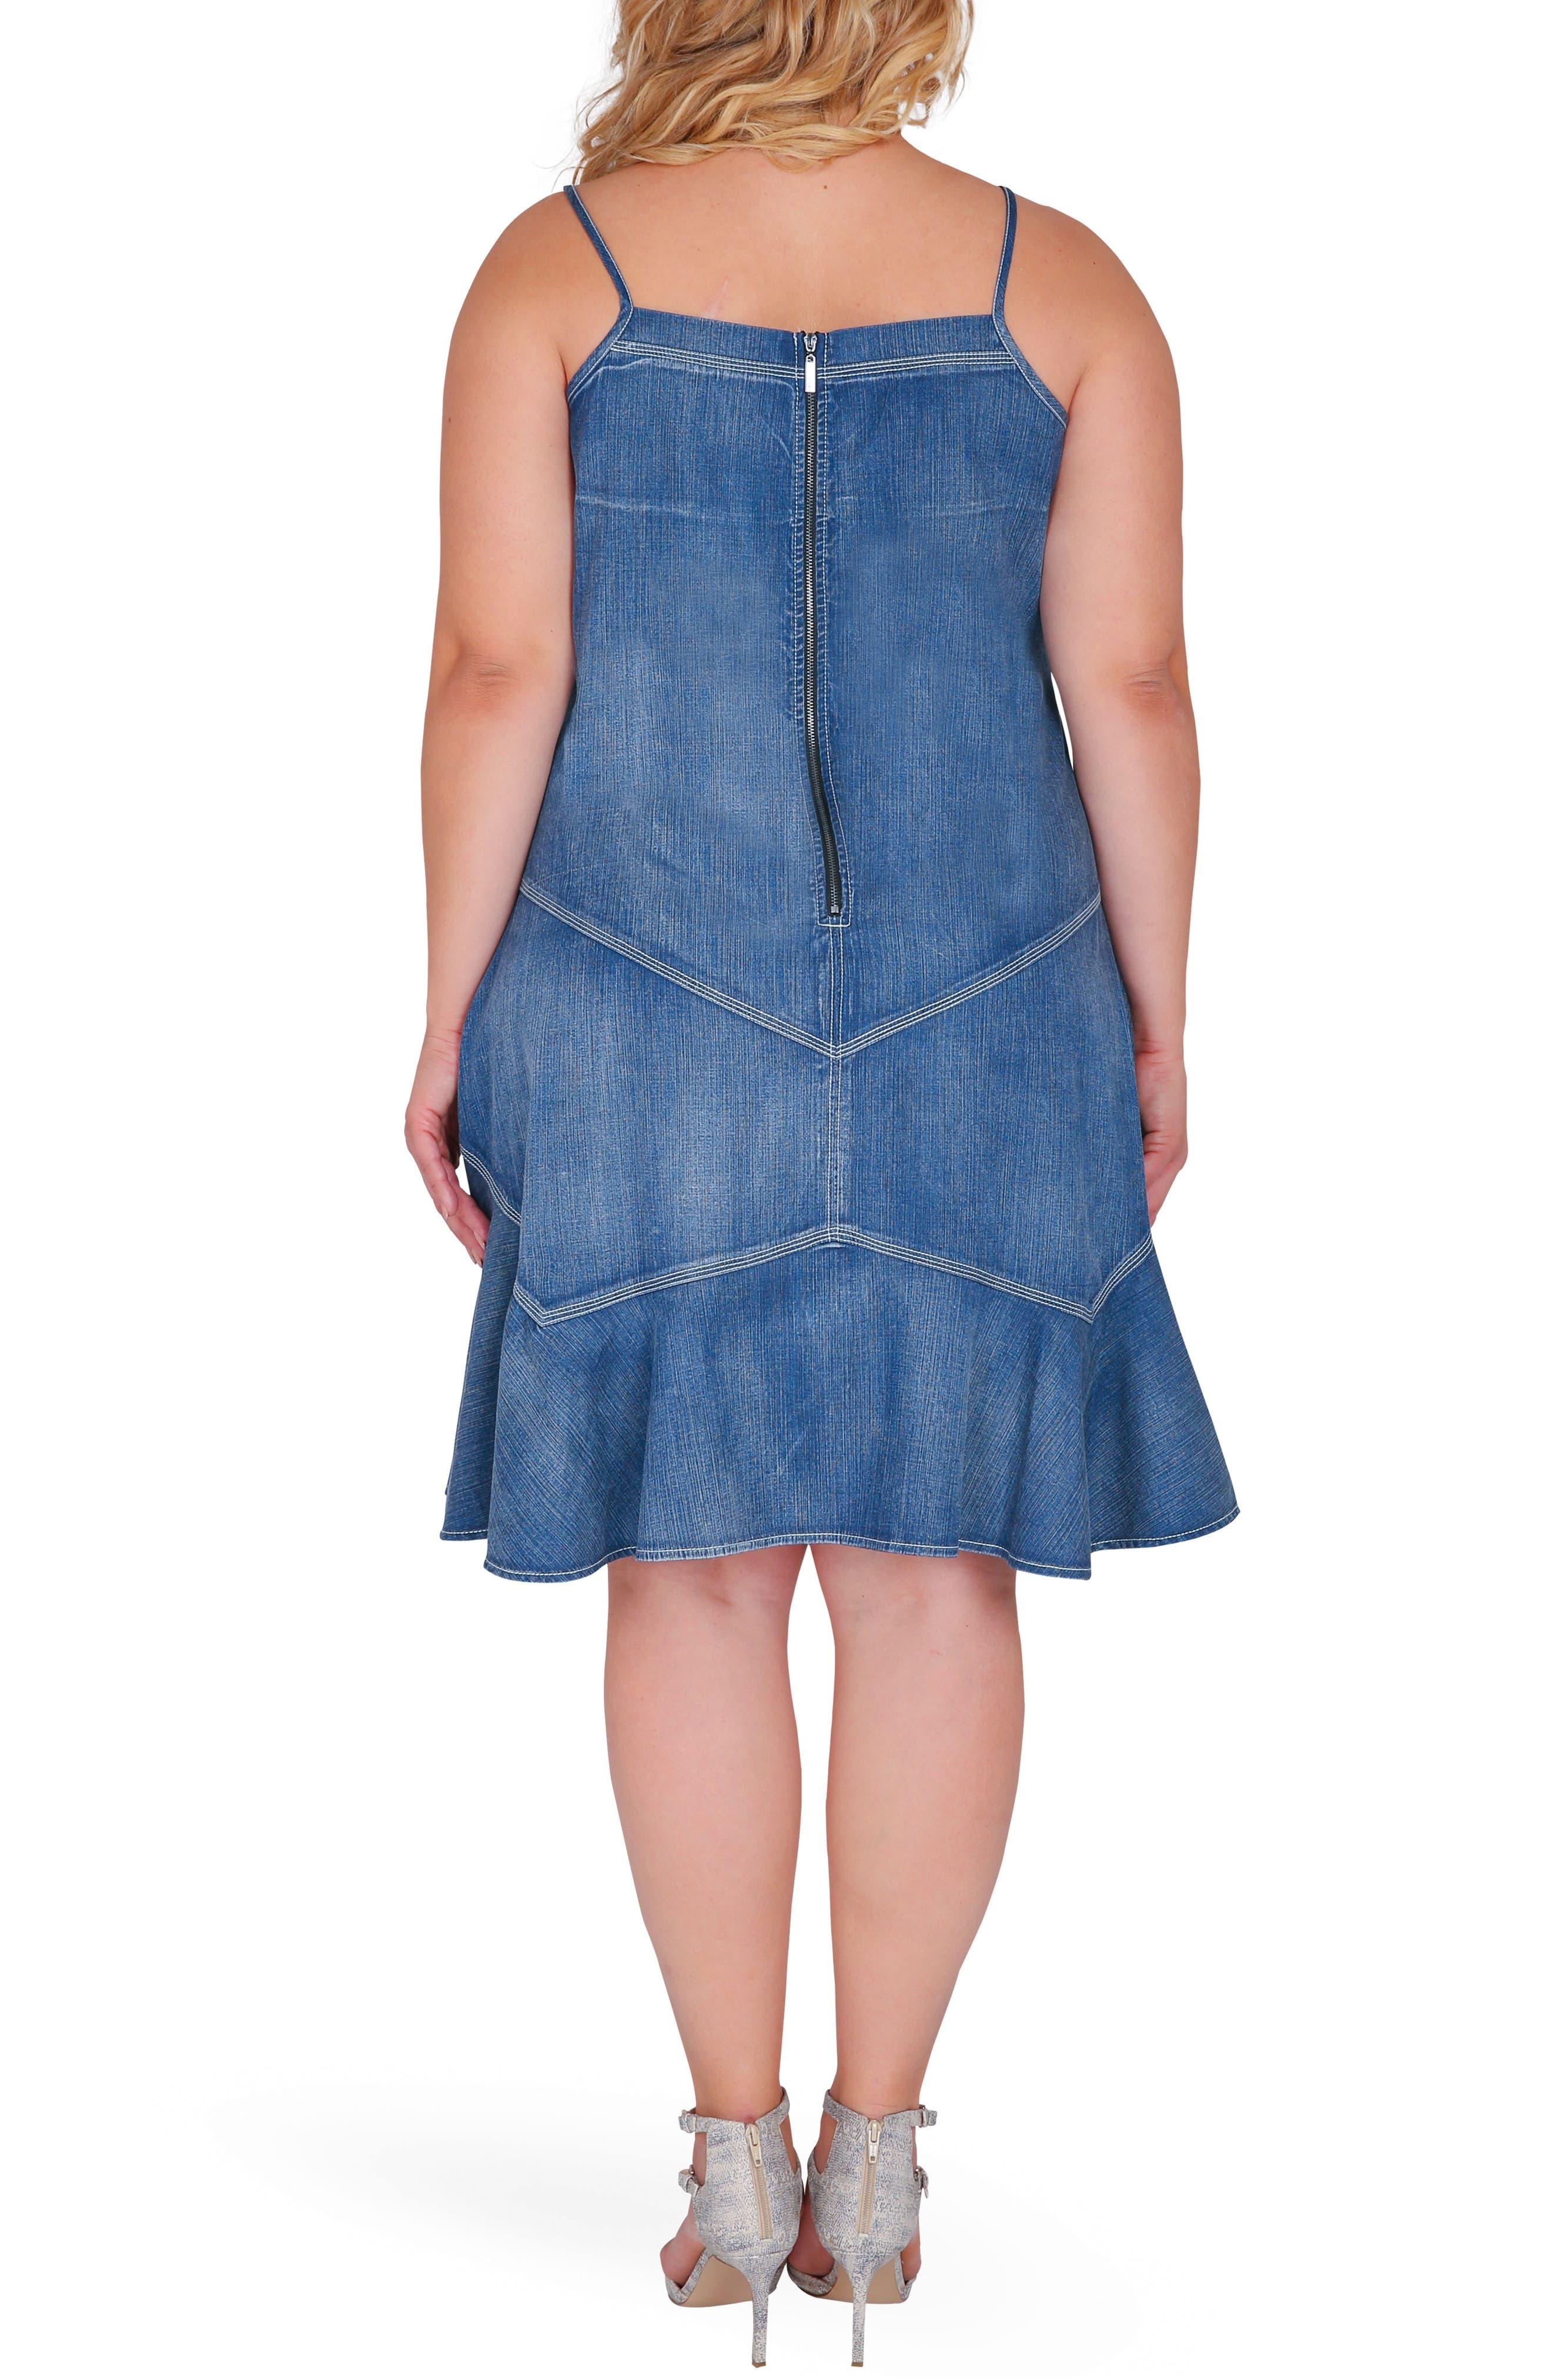 Rosie Denim Tank Dress,                             Alternate thumbnail 2, color,                             Enchanted Blue